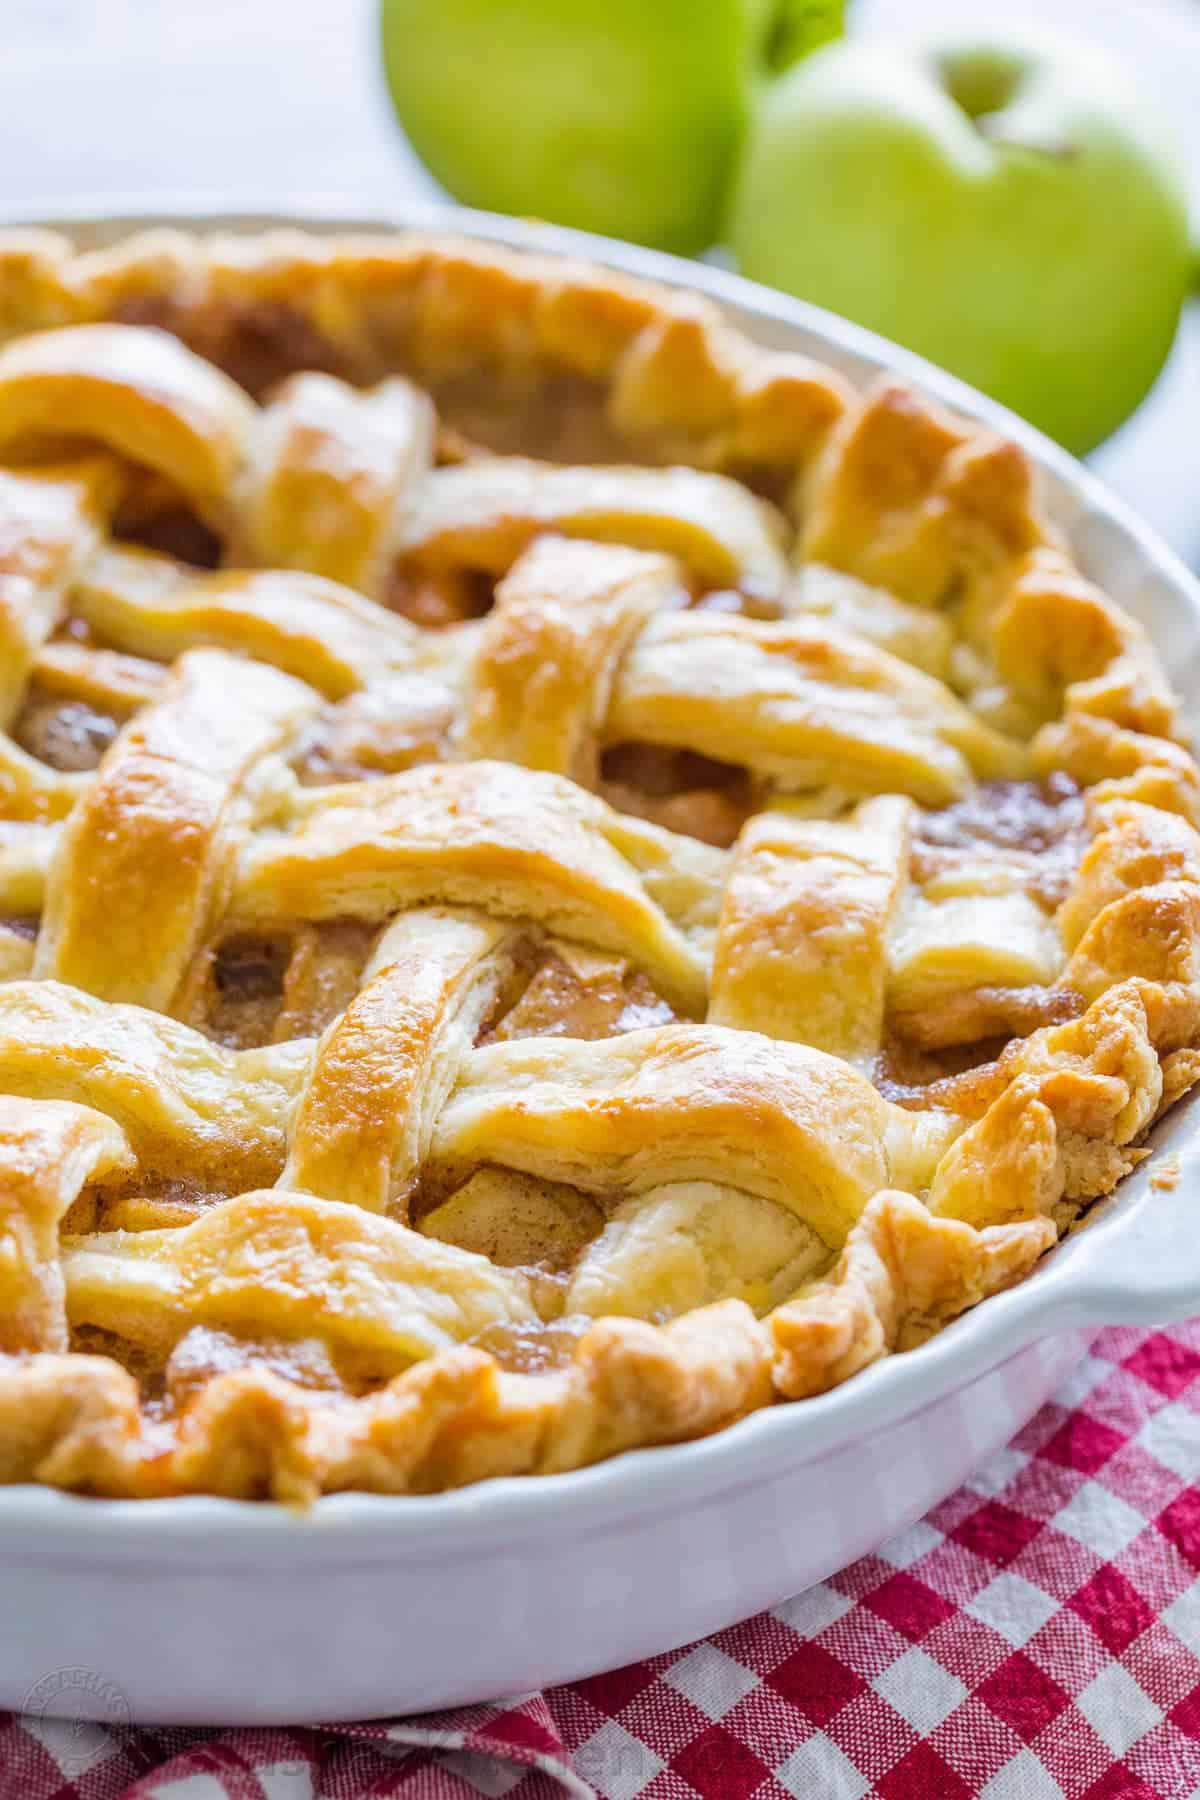 Apple Pie Recipe With The Best Filling Video Natashaskitchen Com